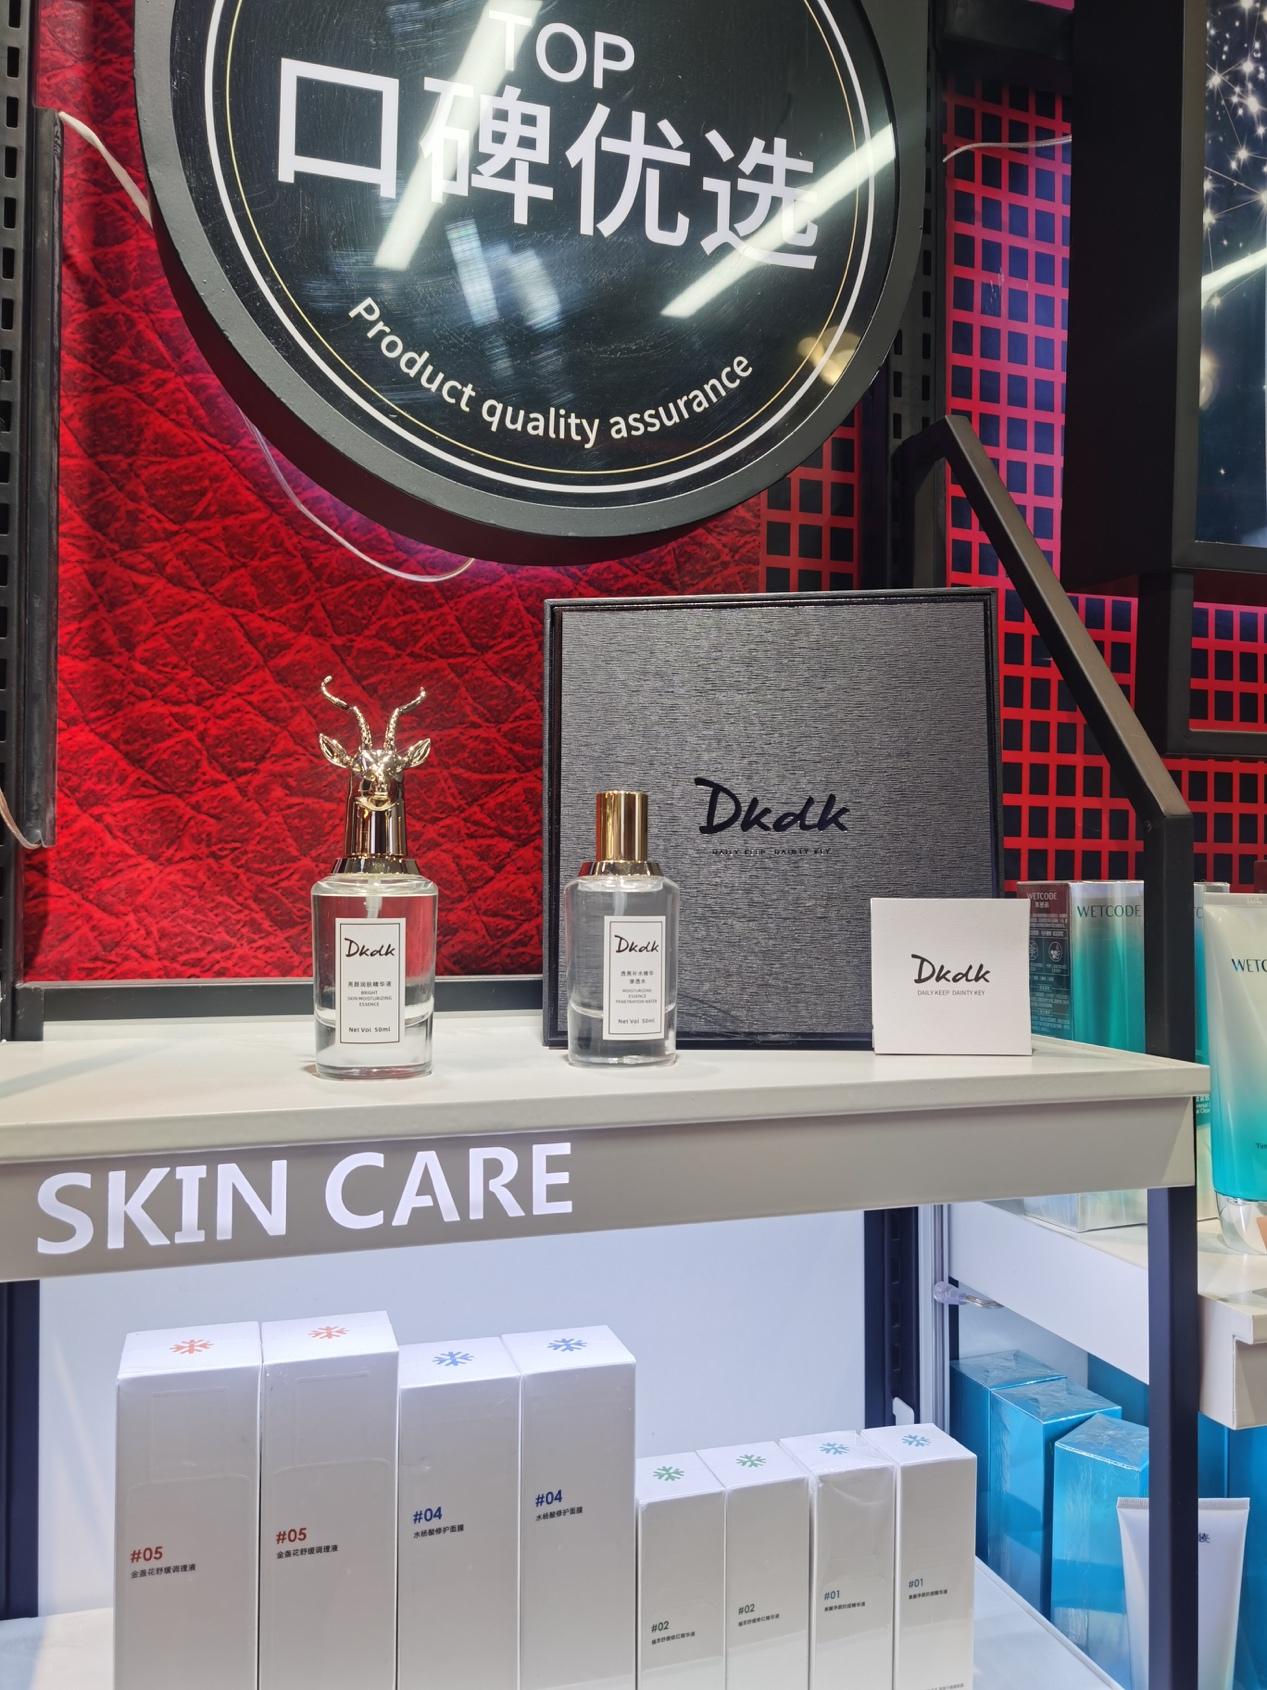 DKDK亮颜润肤精华液全网上线 开启品牌新零售之旅